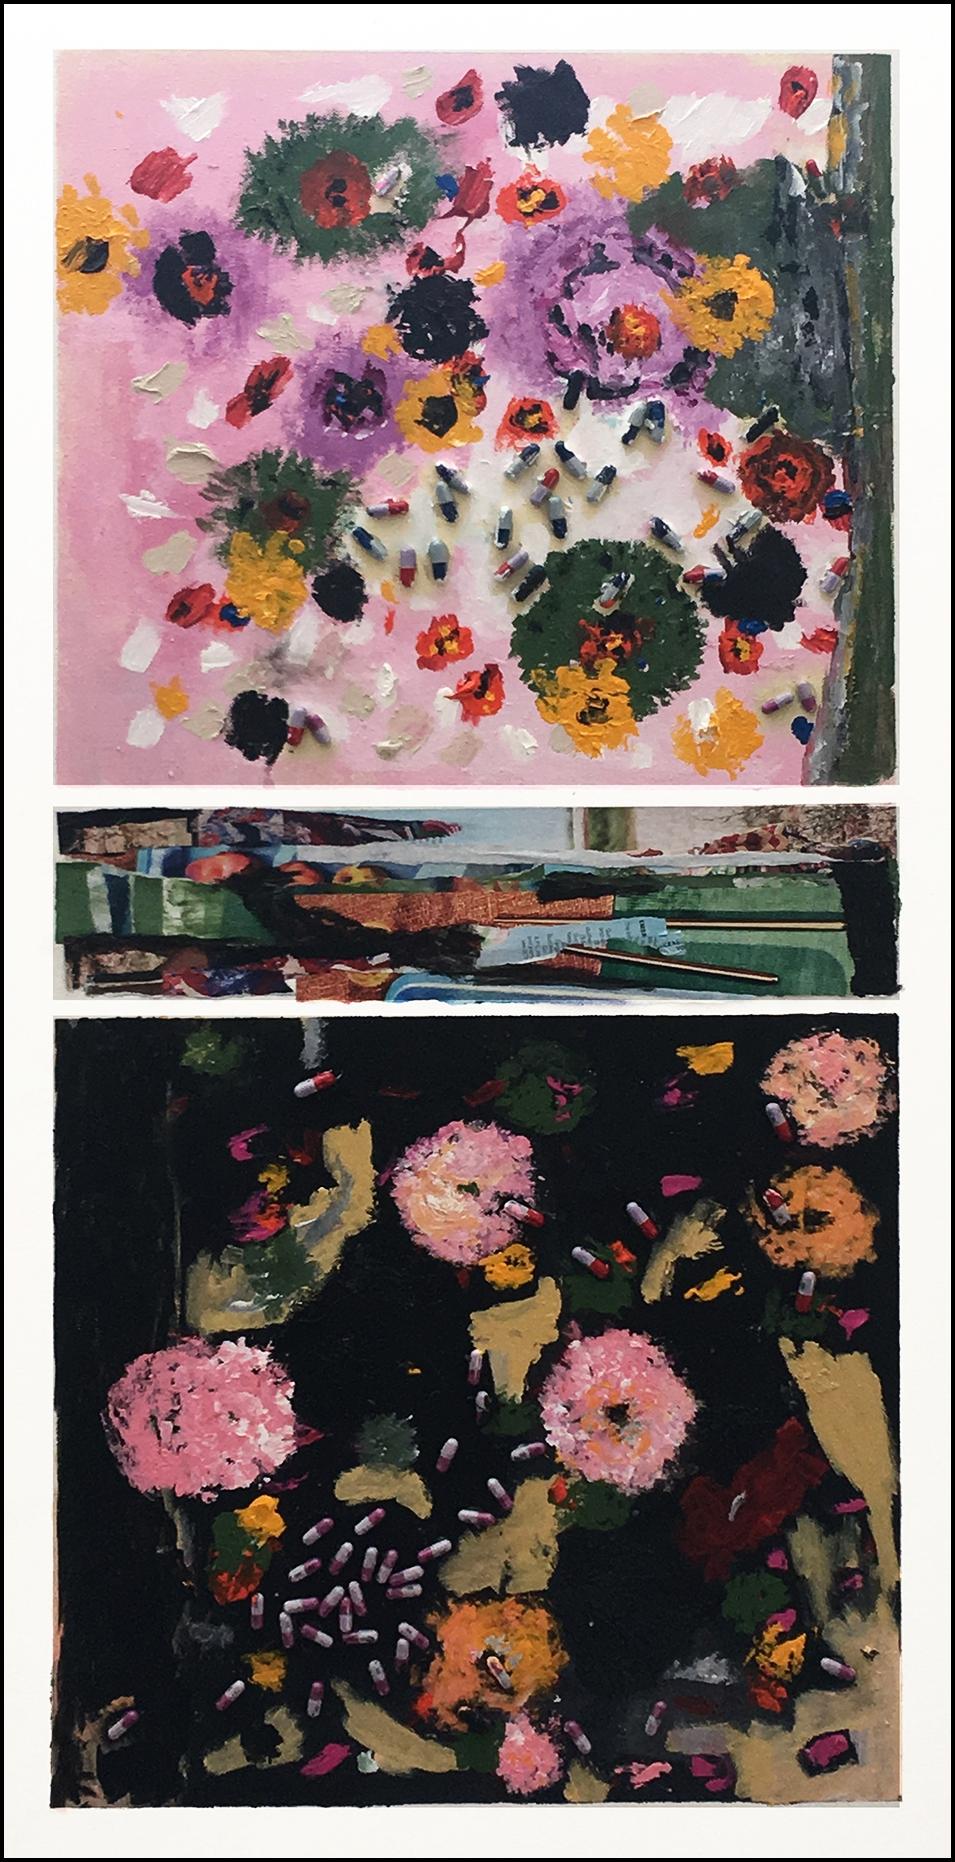 FLOWERY DEATH